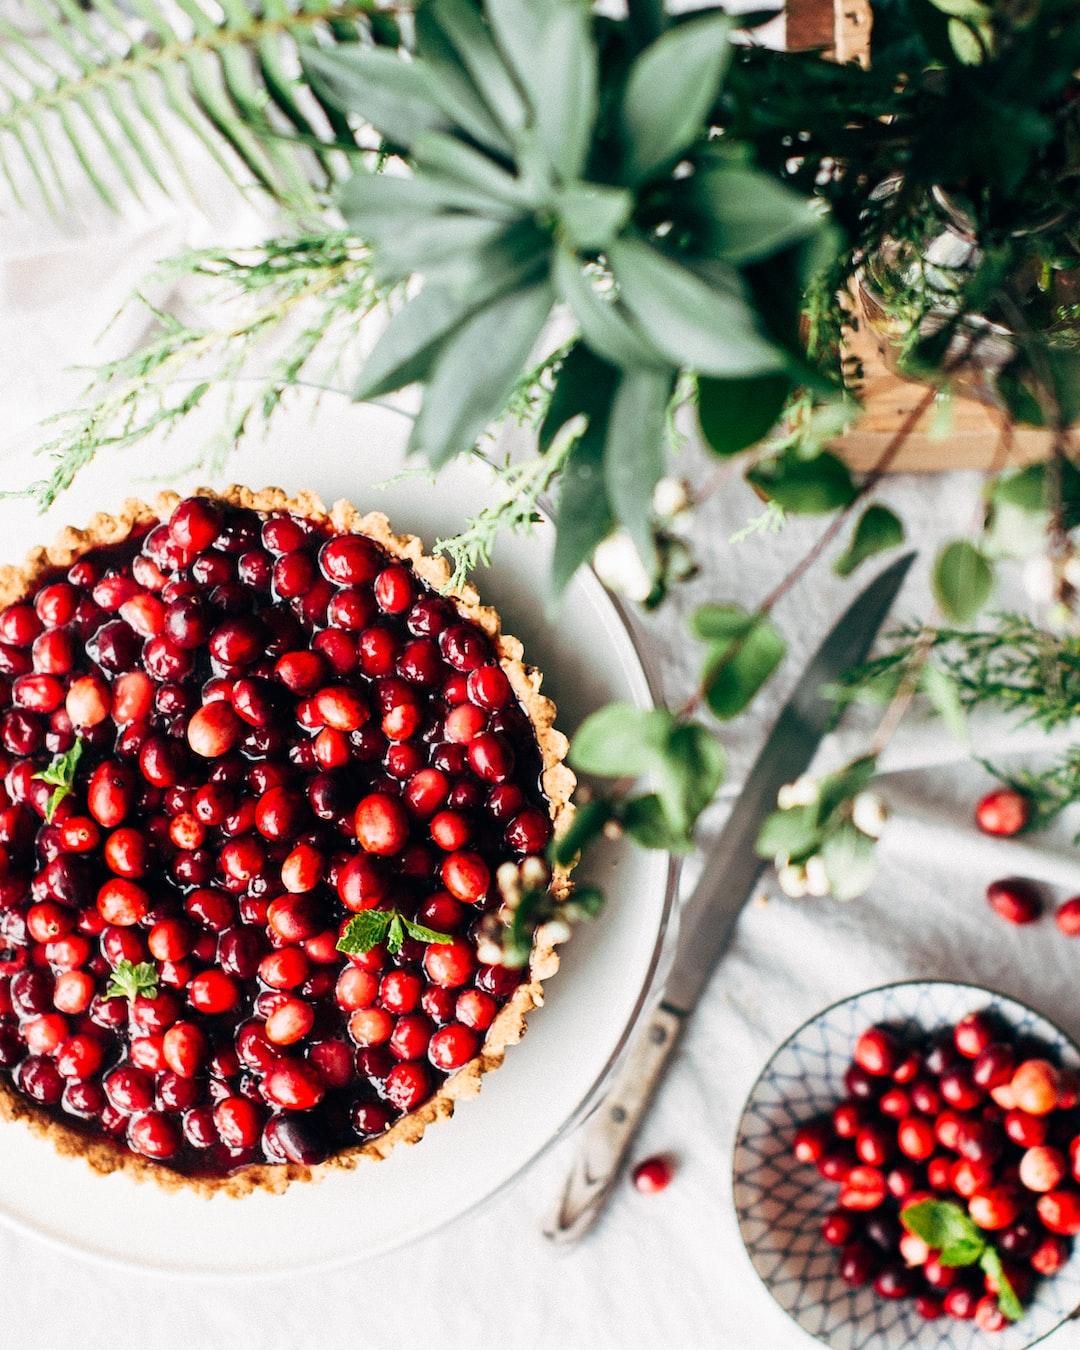 Rustic Cranberry Pie